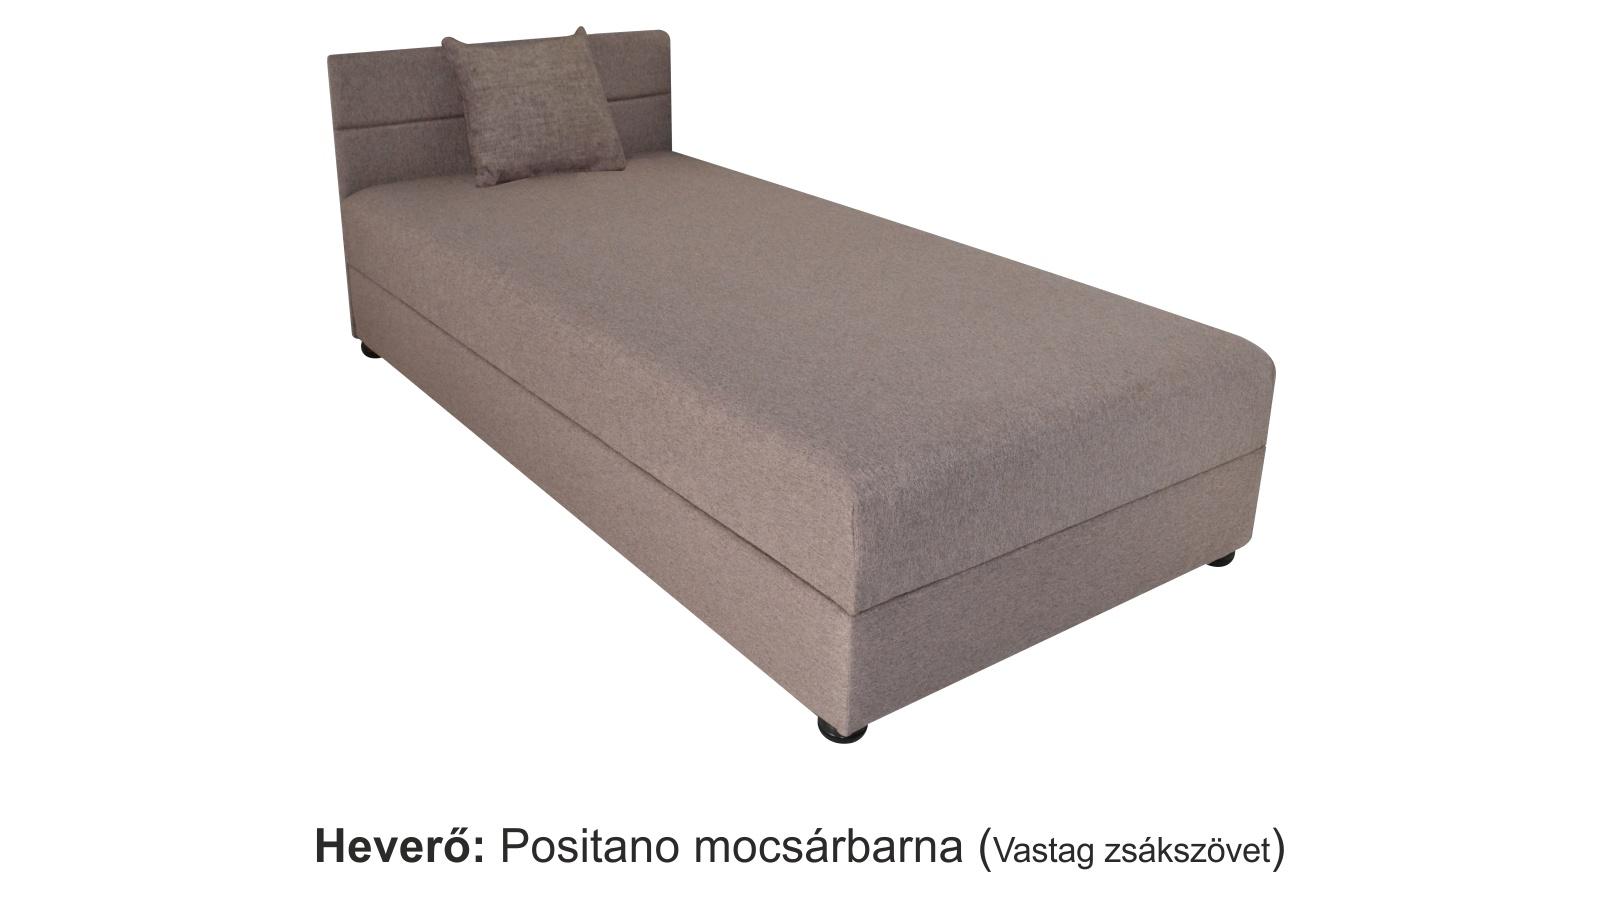 Big_heverő_positano